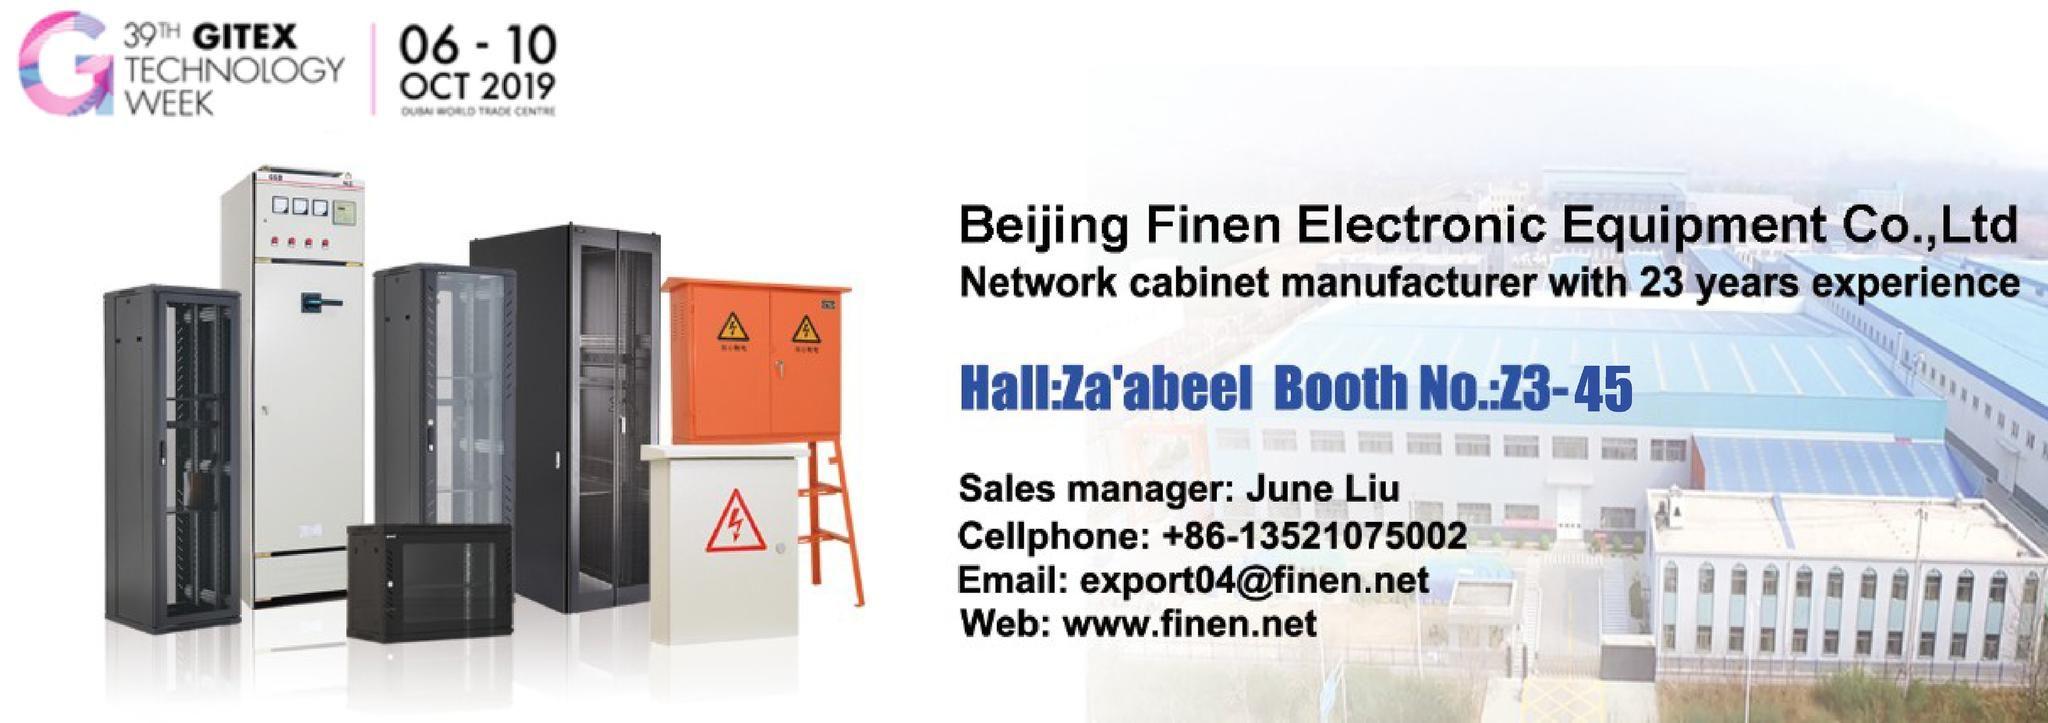 Beijing Finen Electronic Equipment Co.Ltd